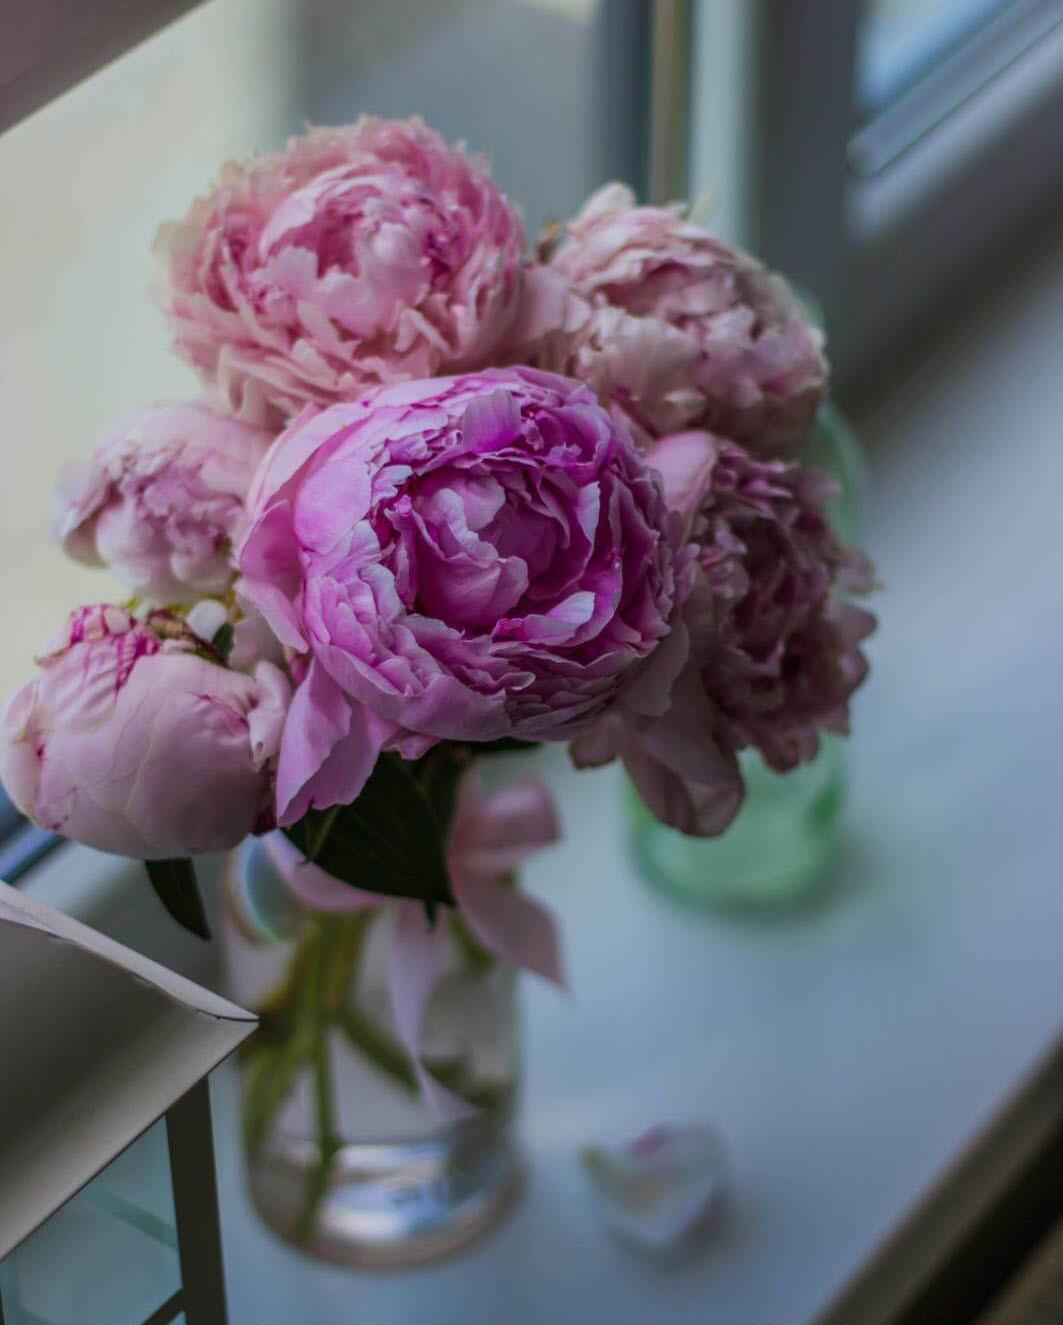 Pink Peony Flowers - Original image